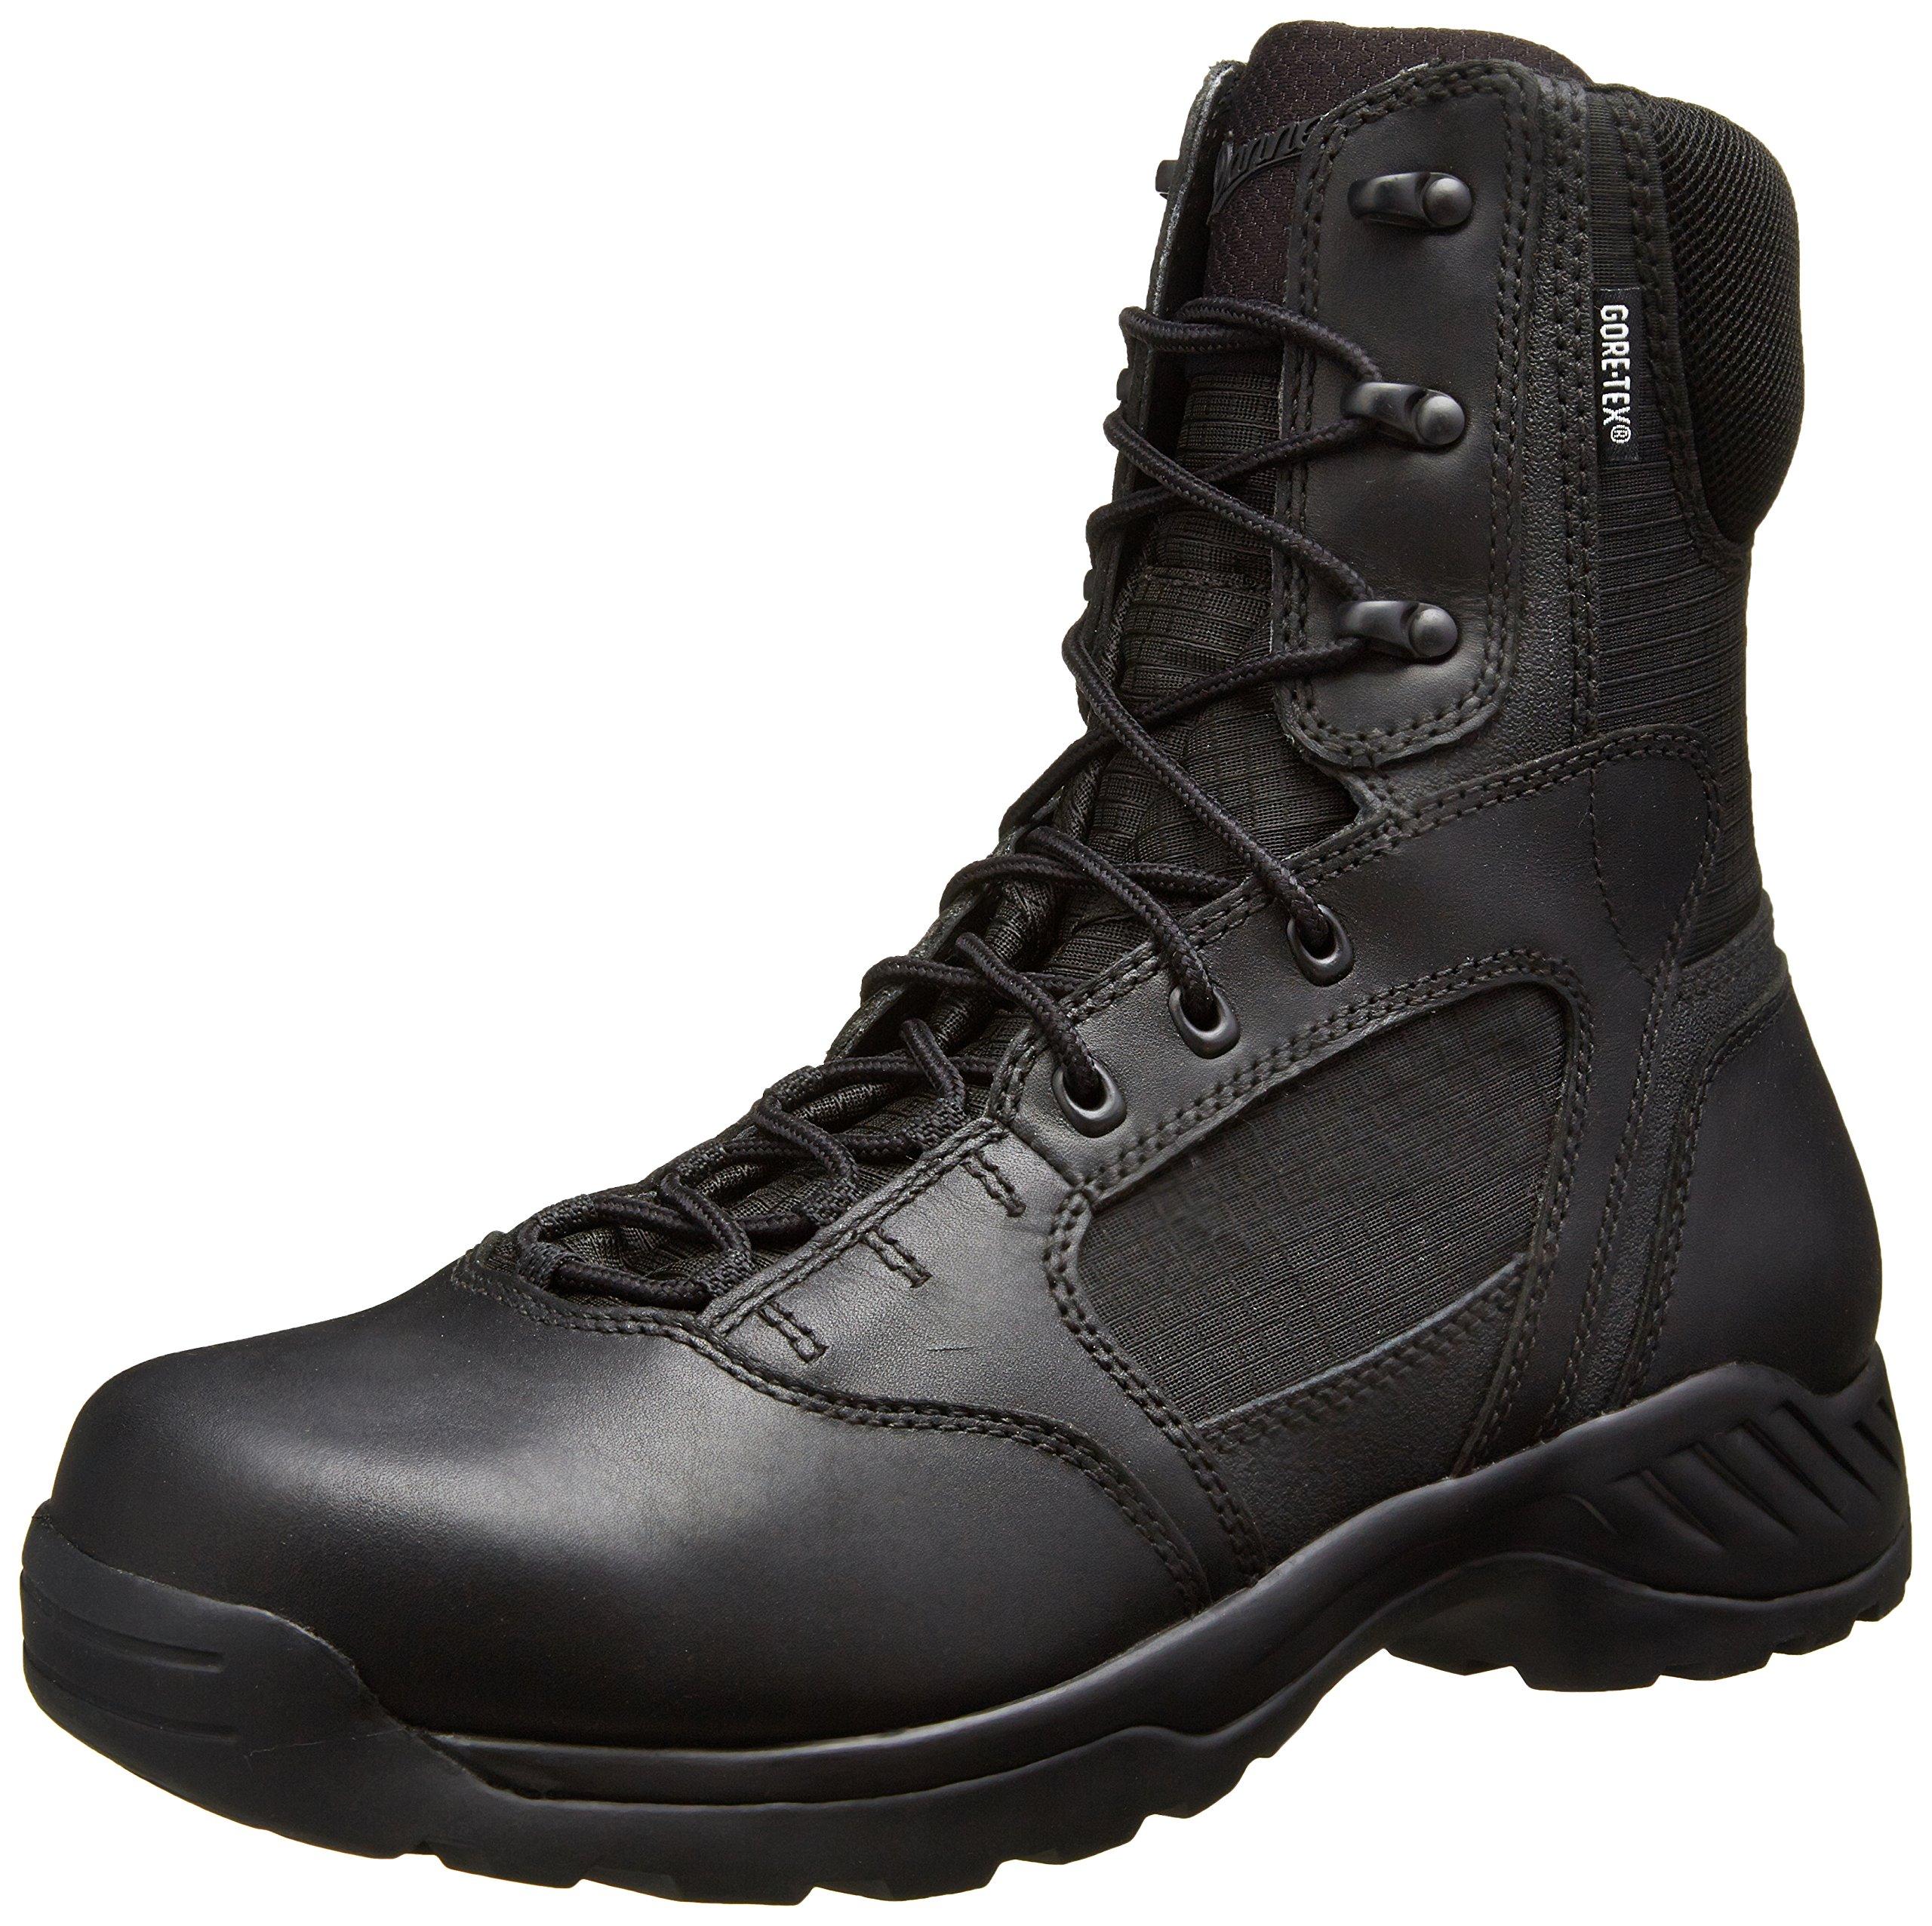 "Danner Men's Kinetic 8"" GTX Uniform Boot, Black, 10.5 D US"